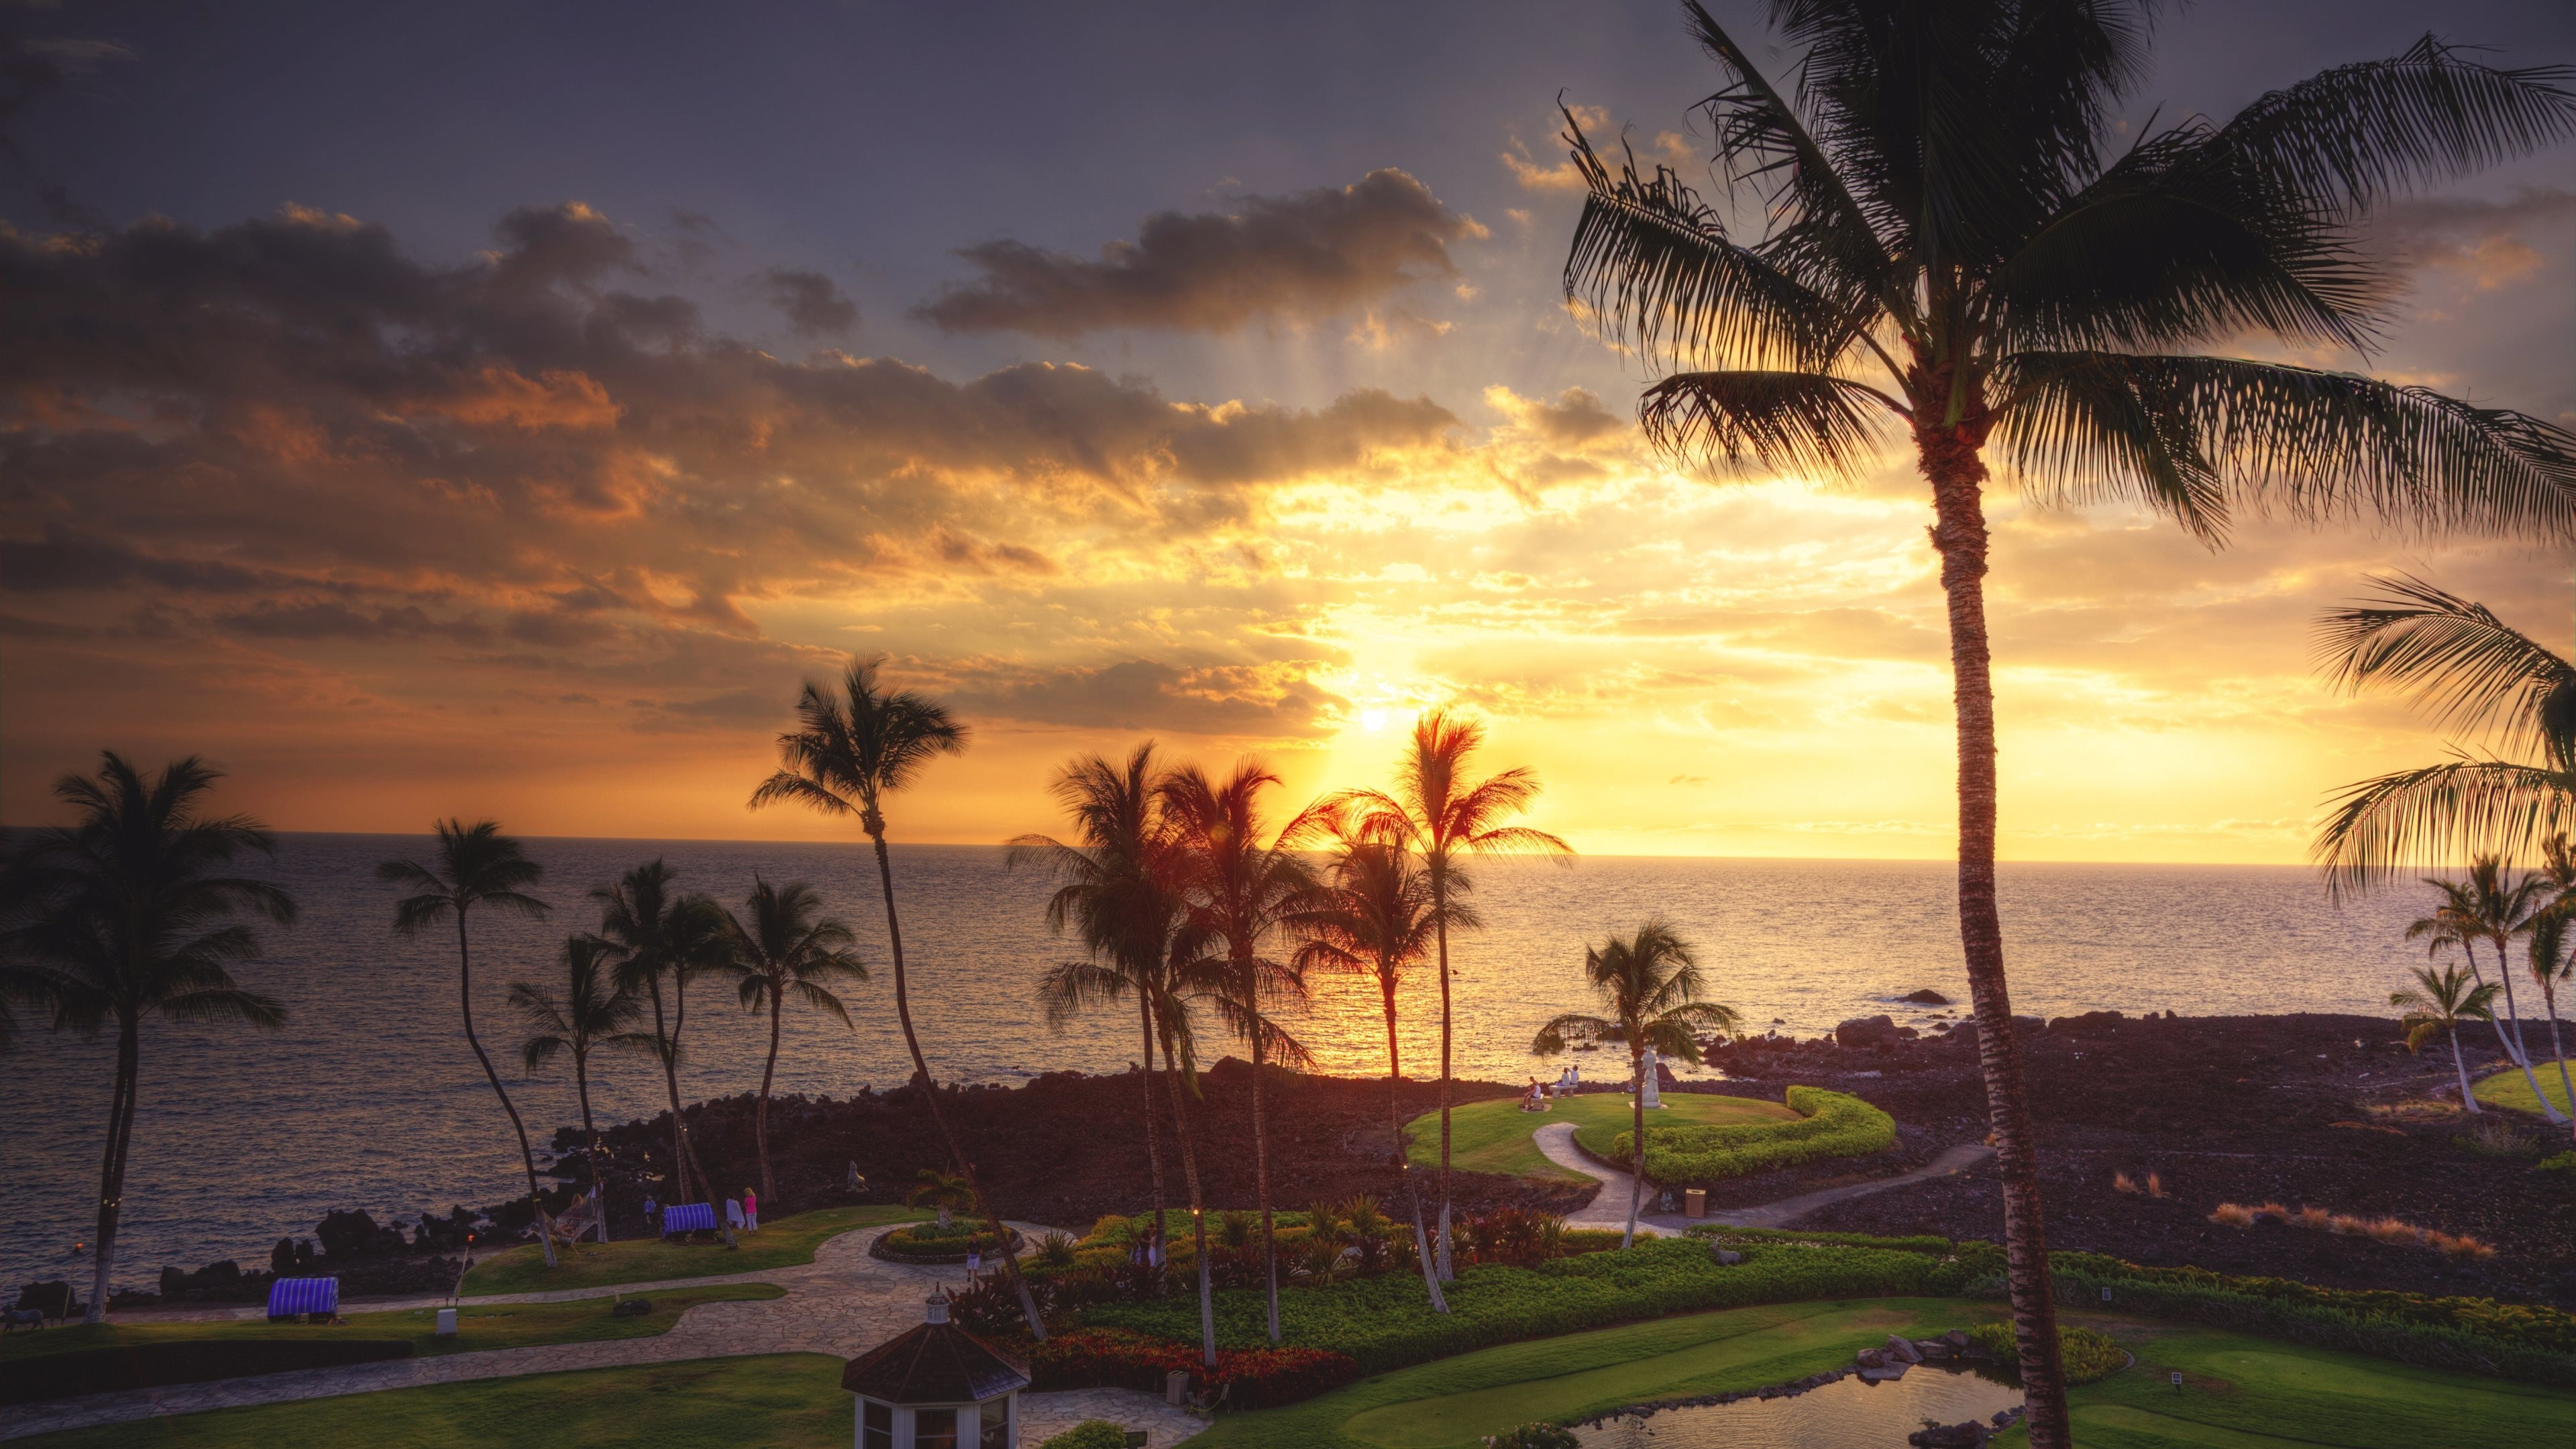 Res: 3840x2160, 4K Hawaii Wallpapers for Desktop 8. Previous Wallpaper